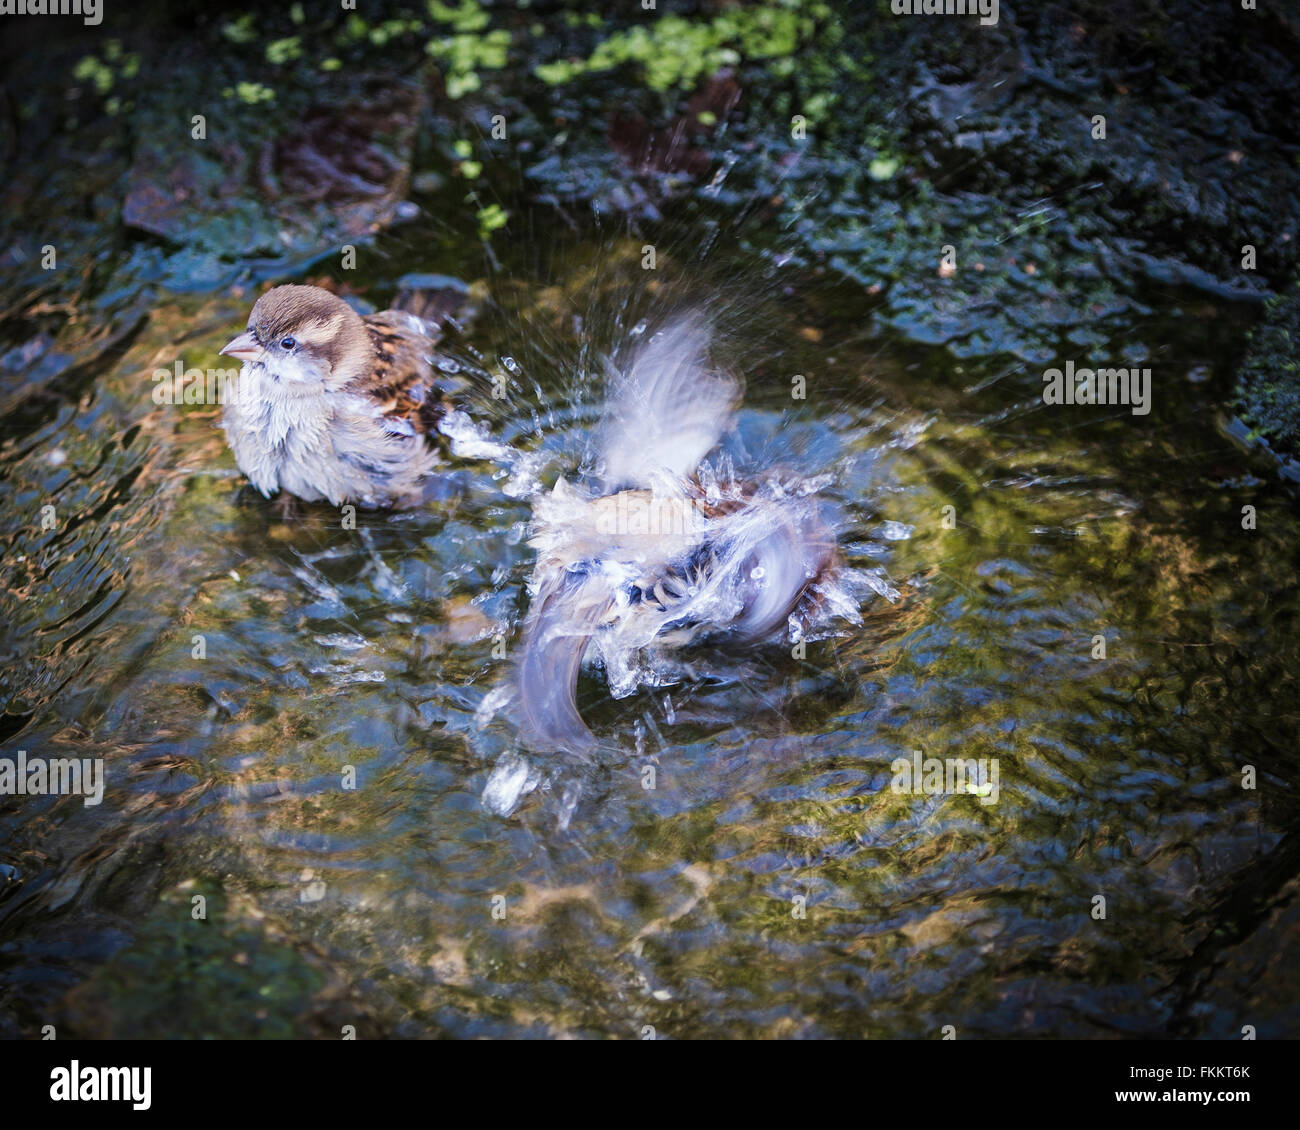 House sparrows bathing in English garden stream Stock Photo